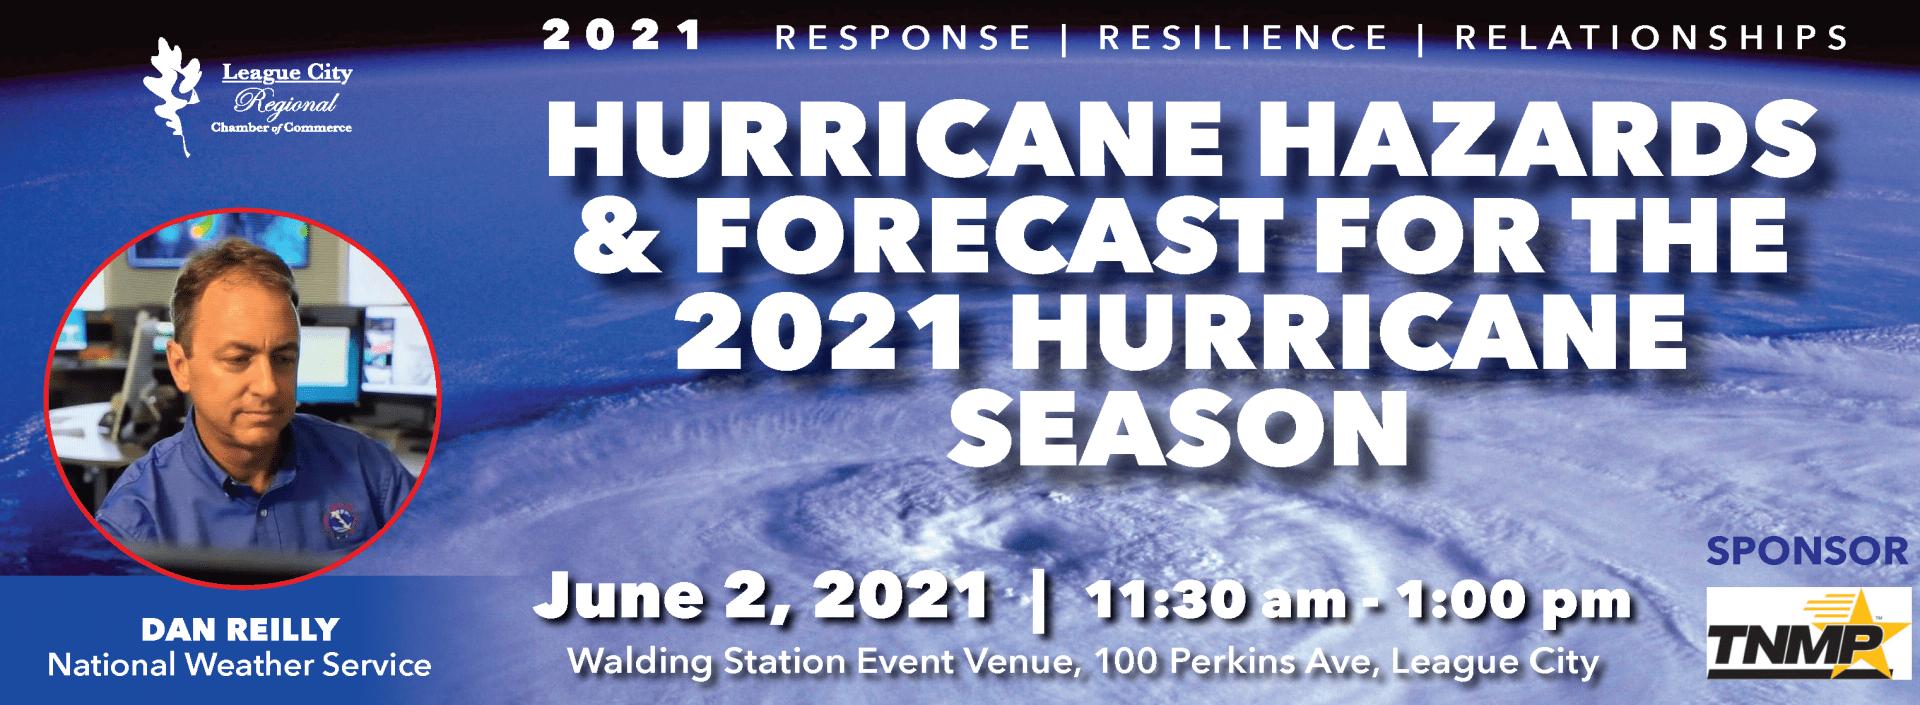 Hurricane-Hazards-21-FB-art-w1920.png